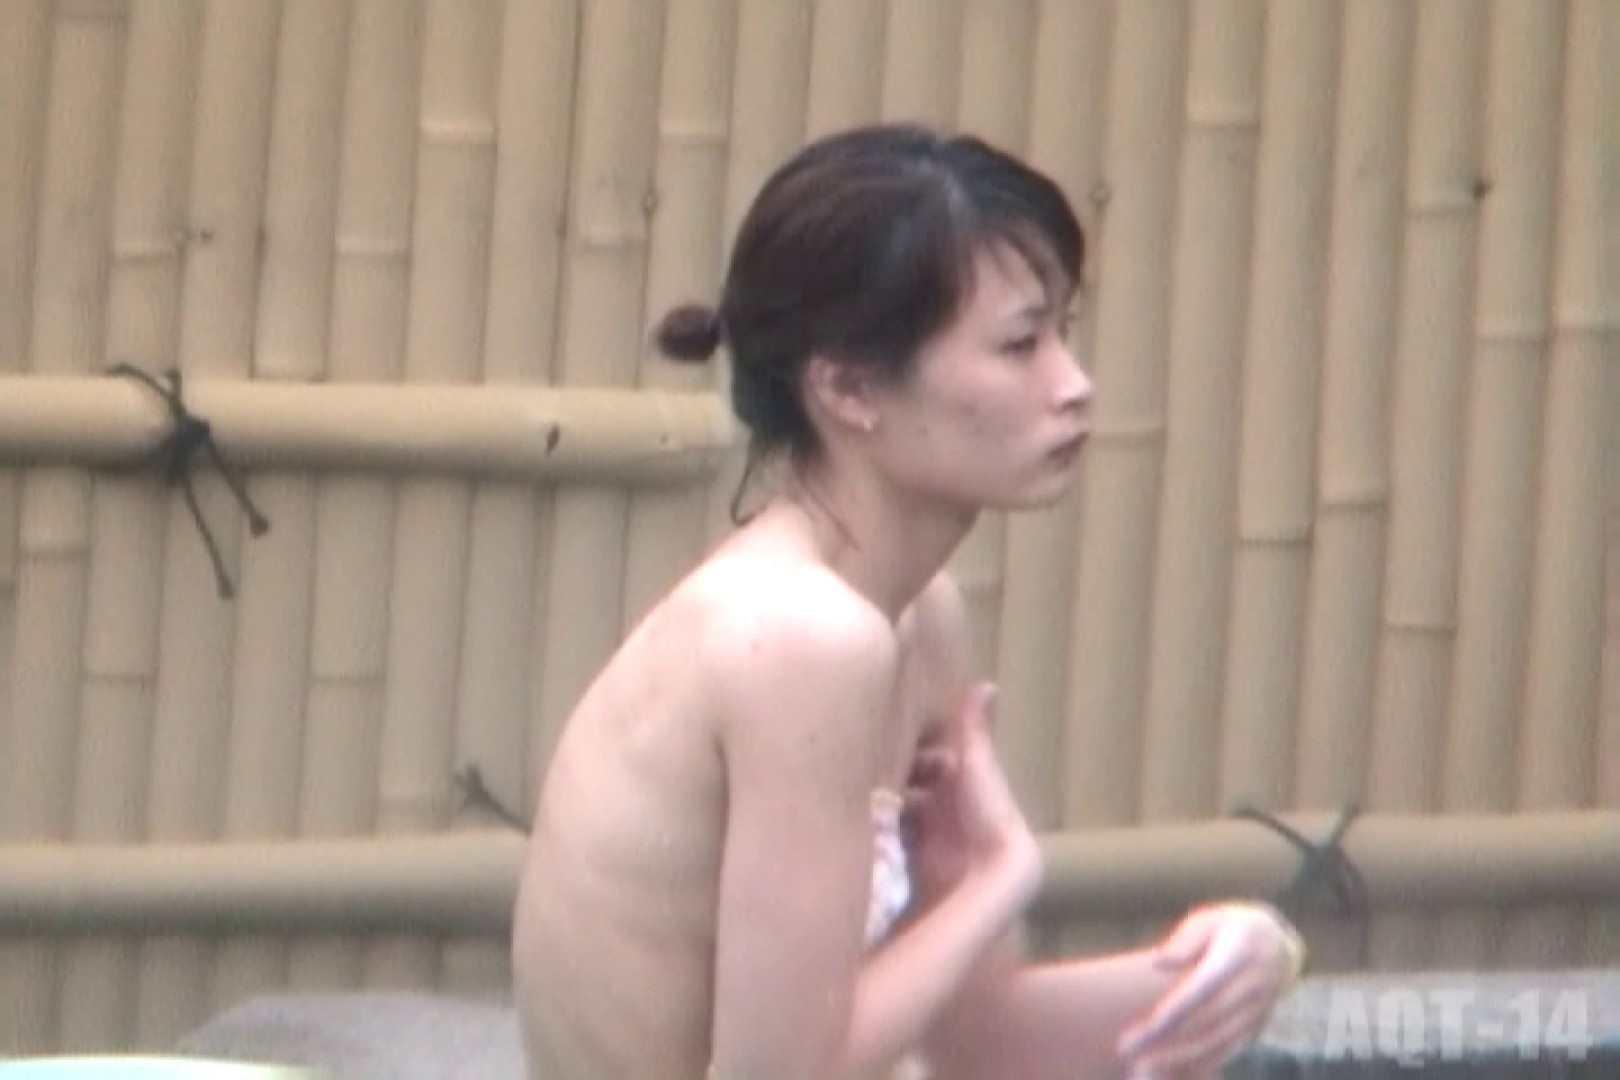 Aquaな露天風呂Vol.822 盗撮師作品 SEX無修正画像 75pic 41